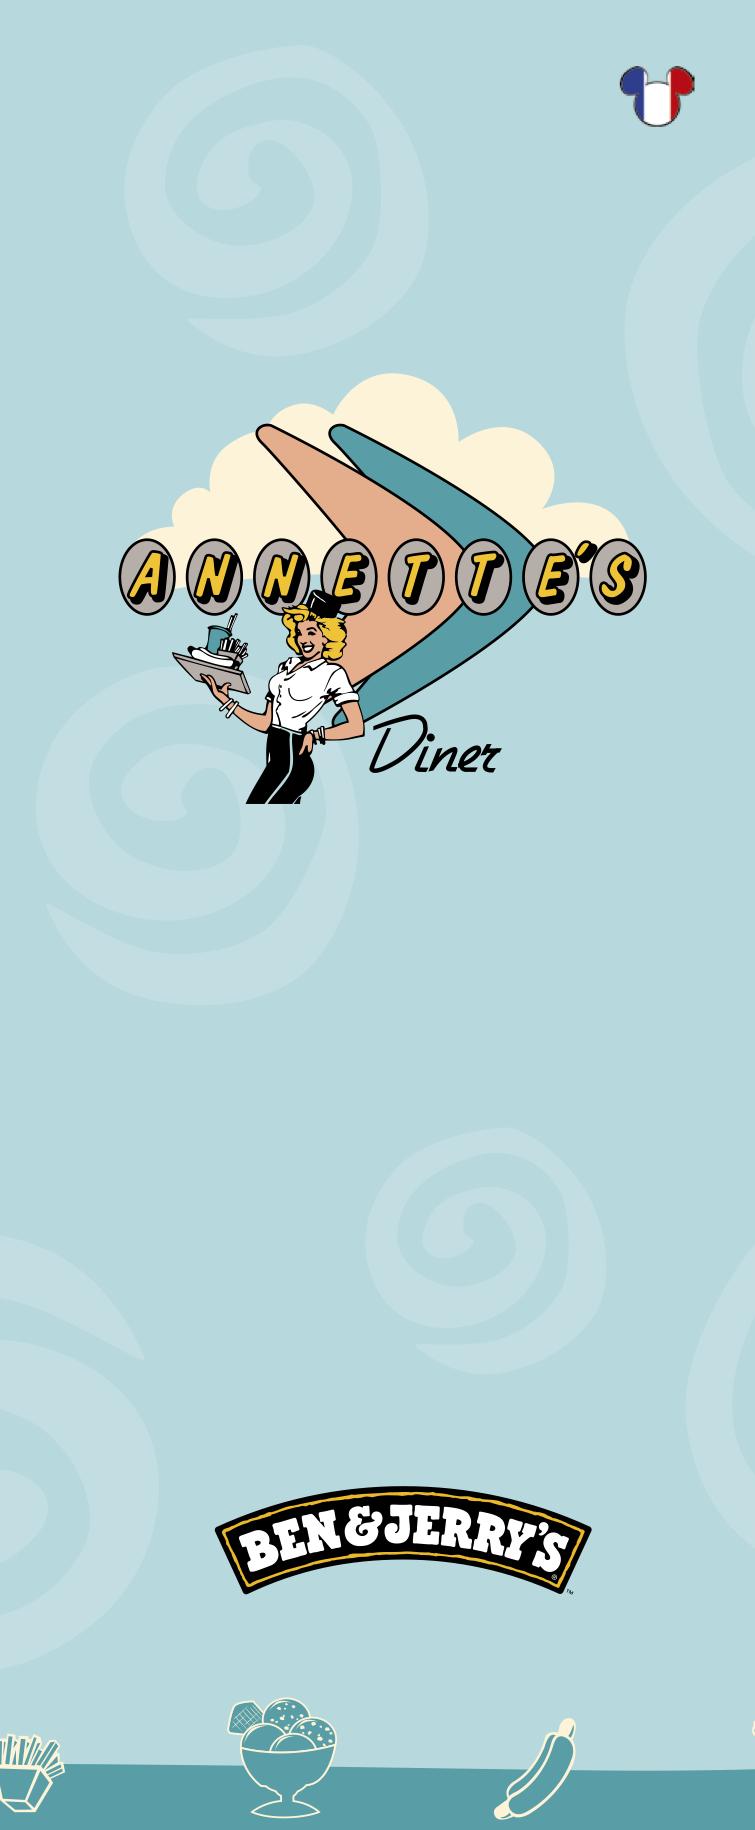 Annette_menu_128x310_120620_FR-V32